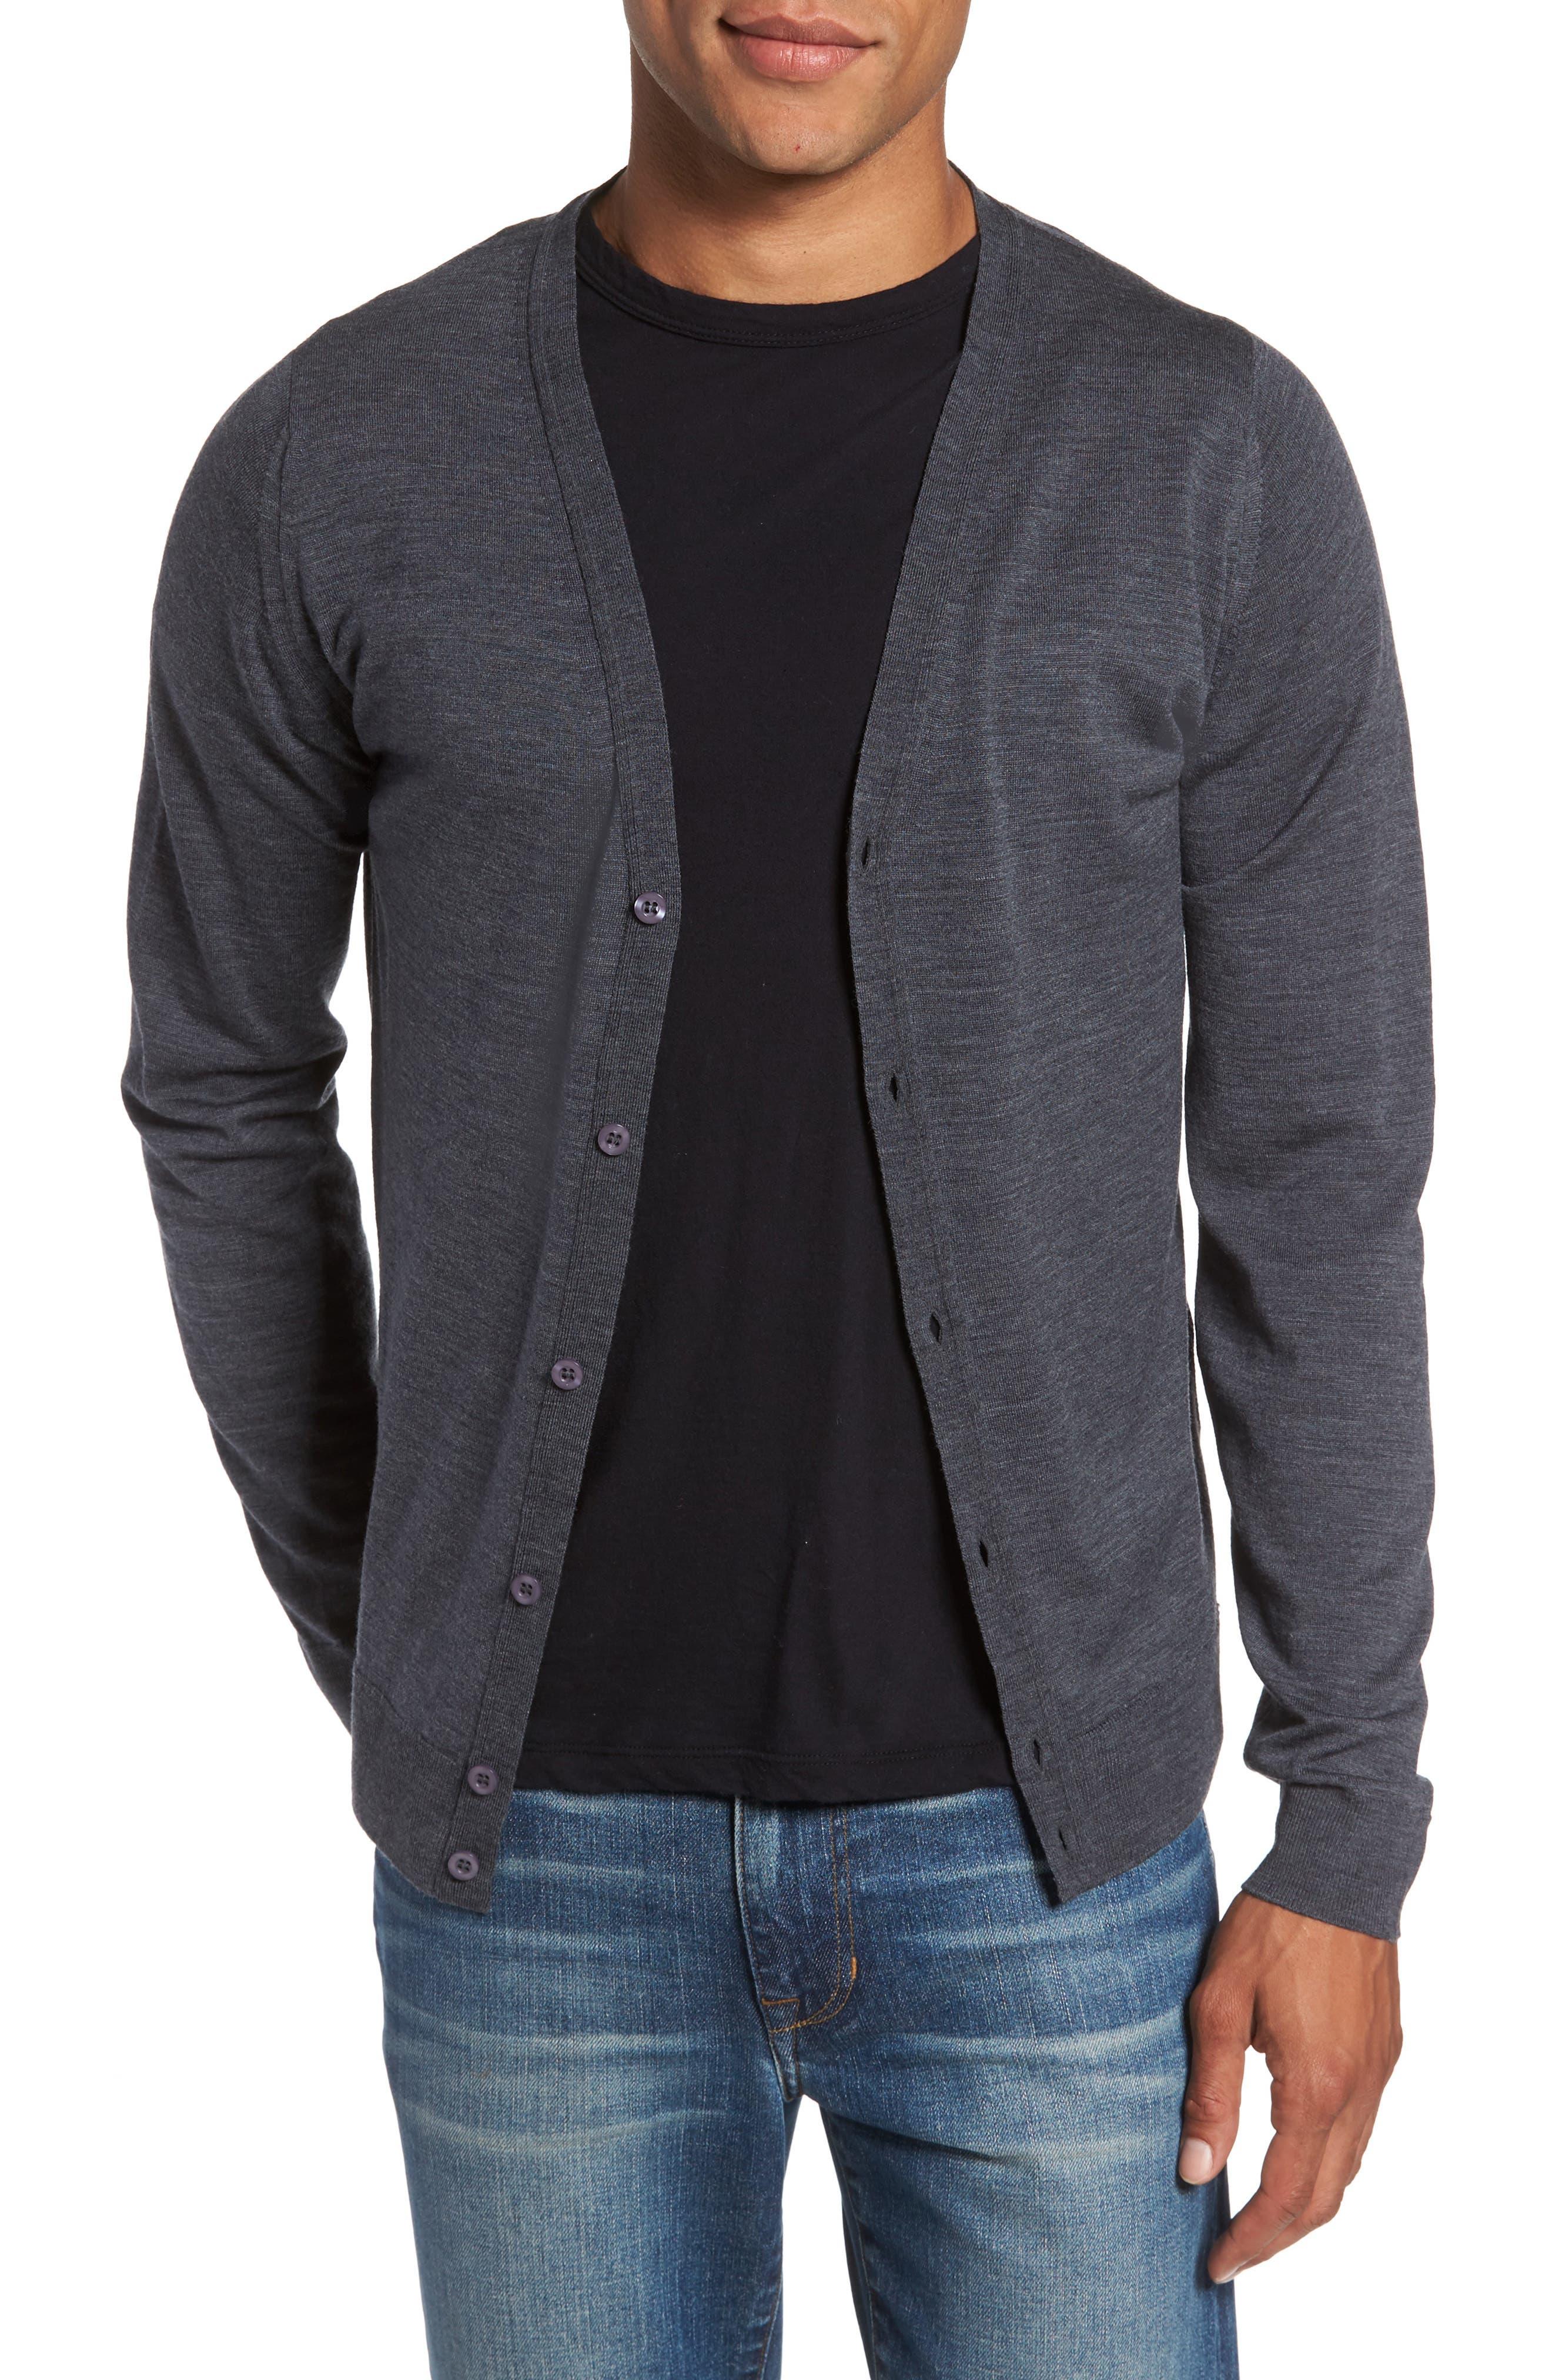 John Smedley Standard Fit Wool Cardigan